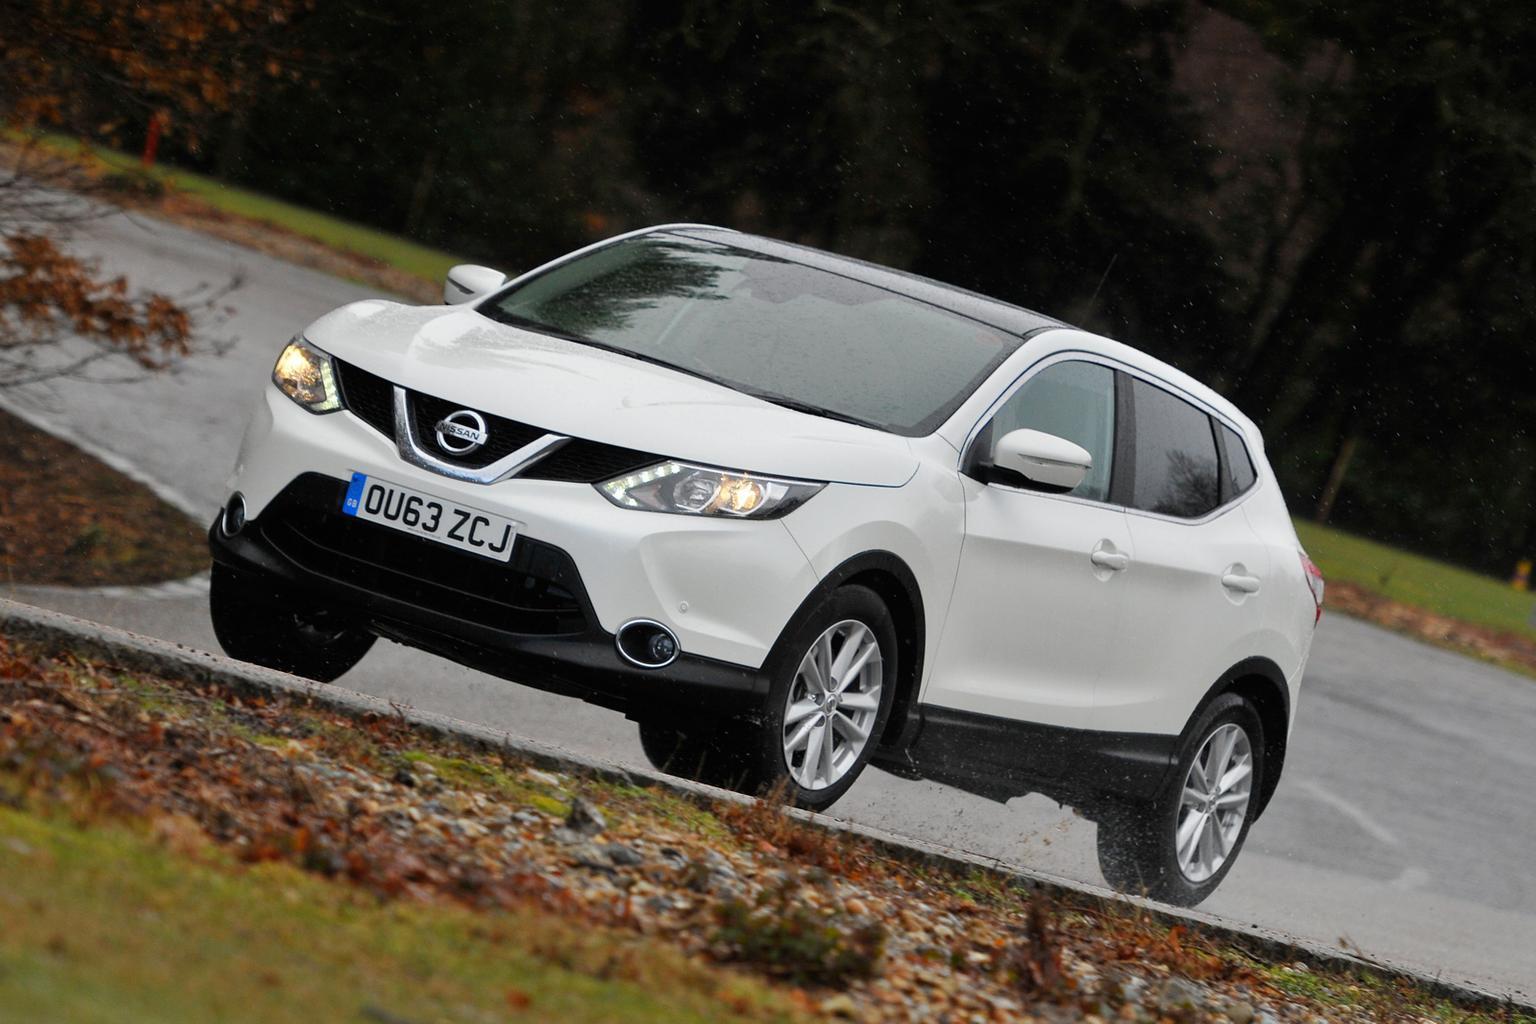 Nissan Qashqai long-term review